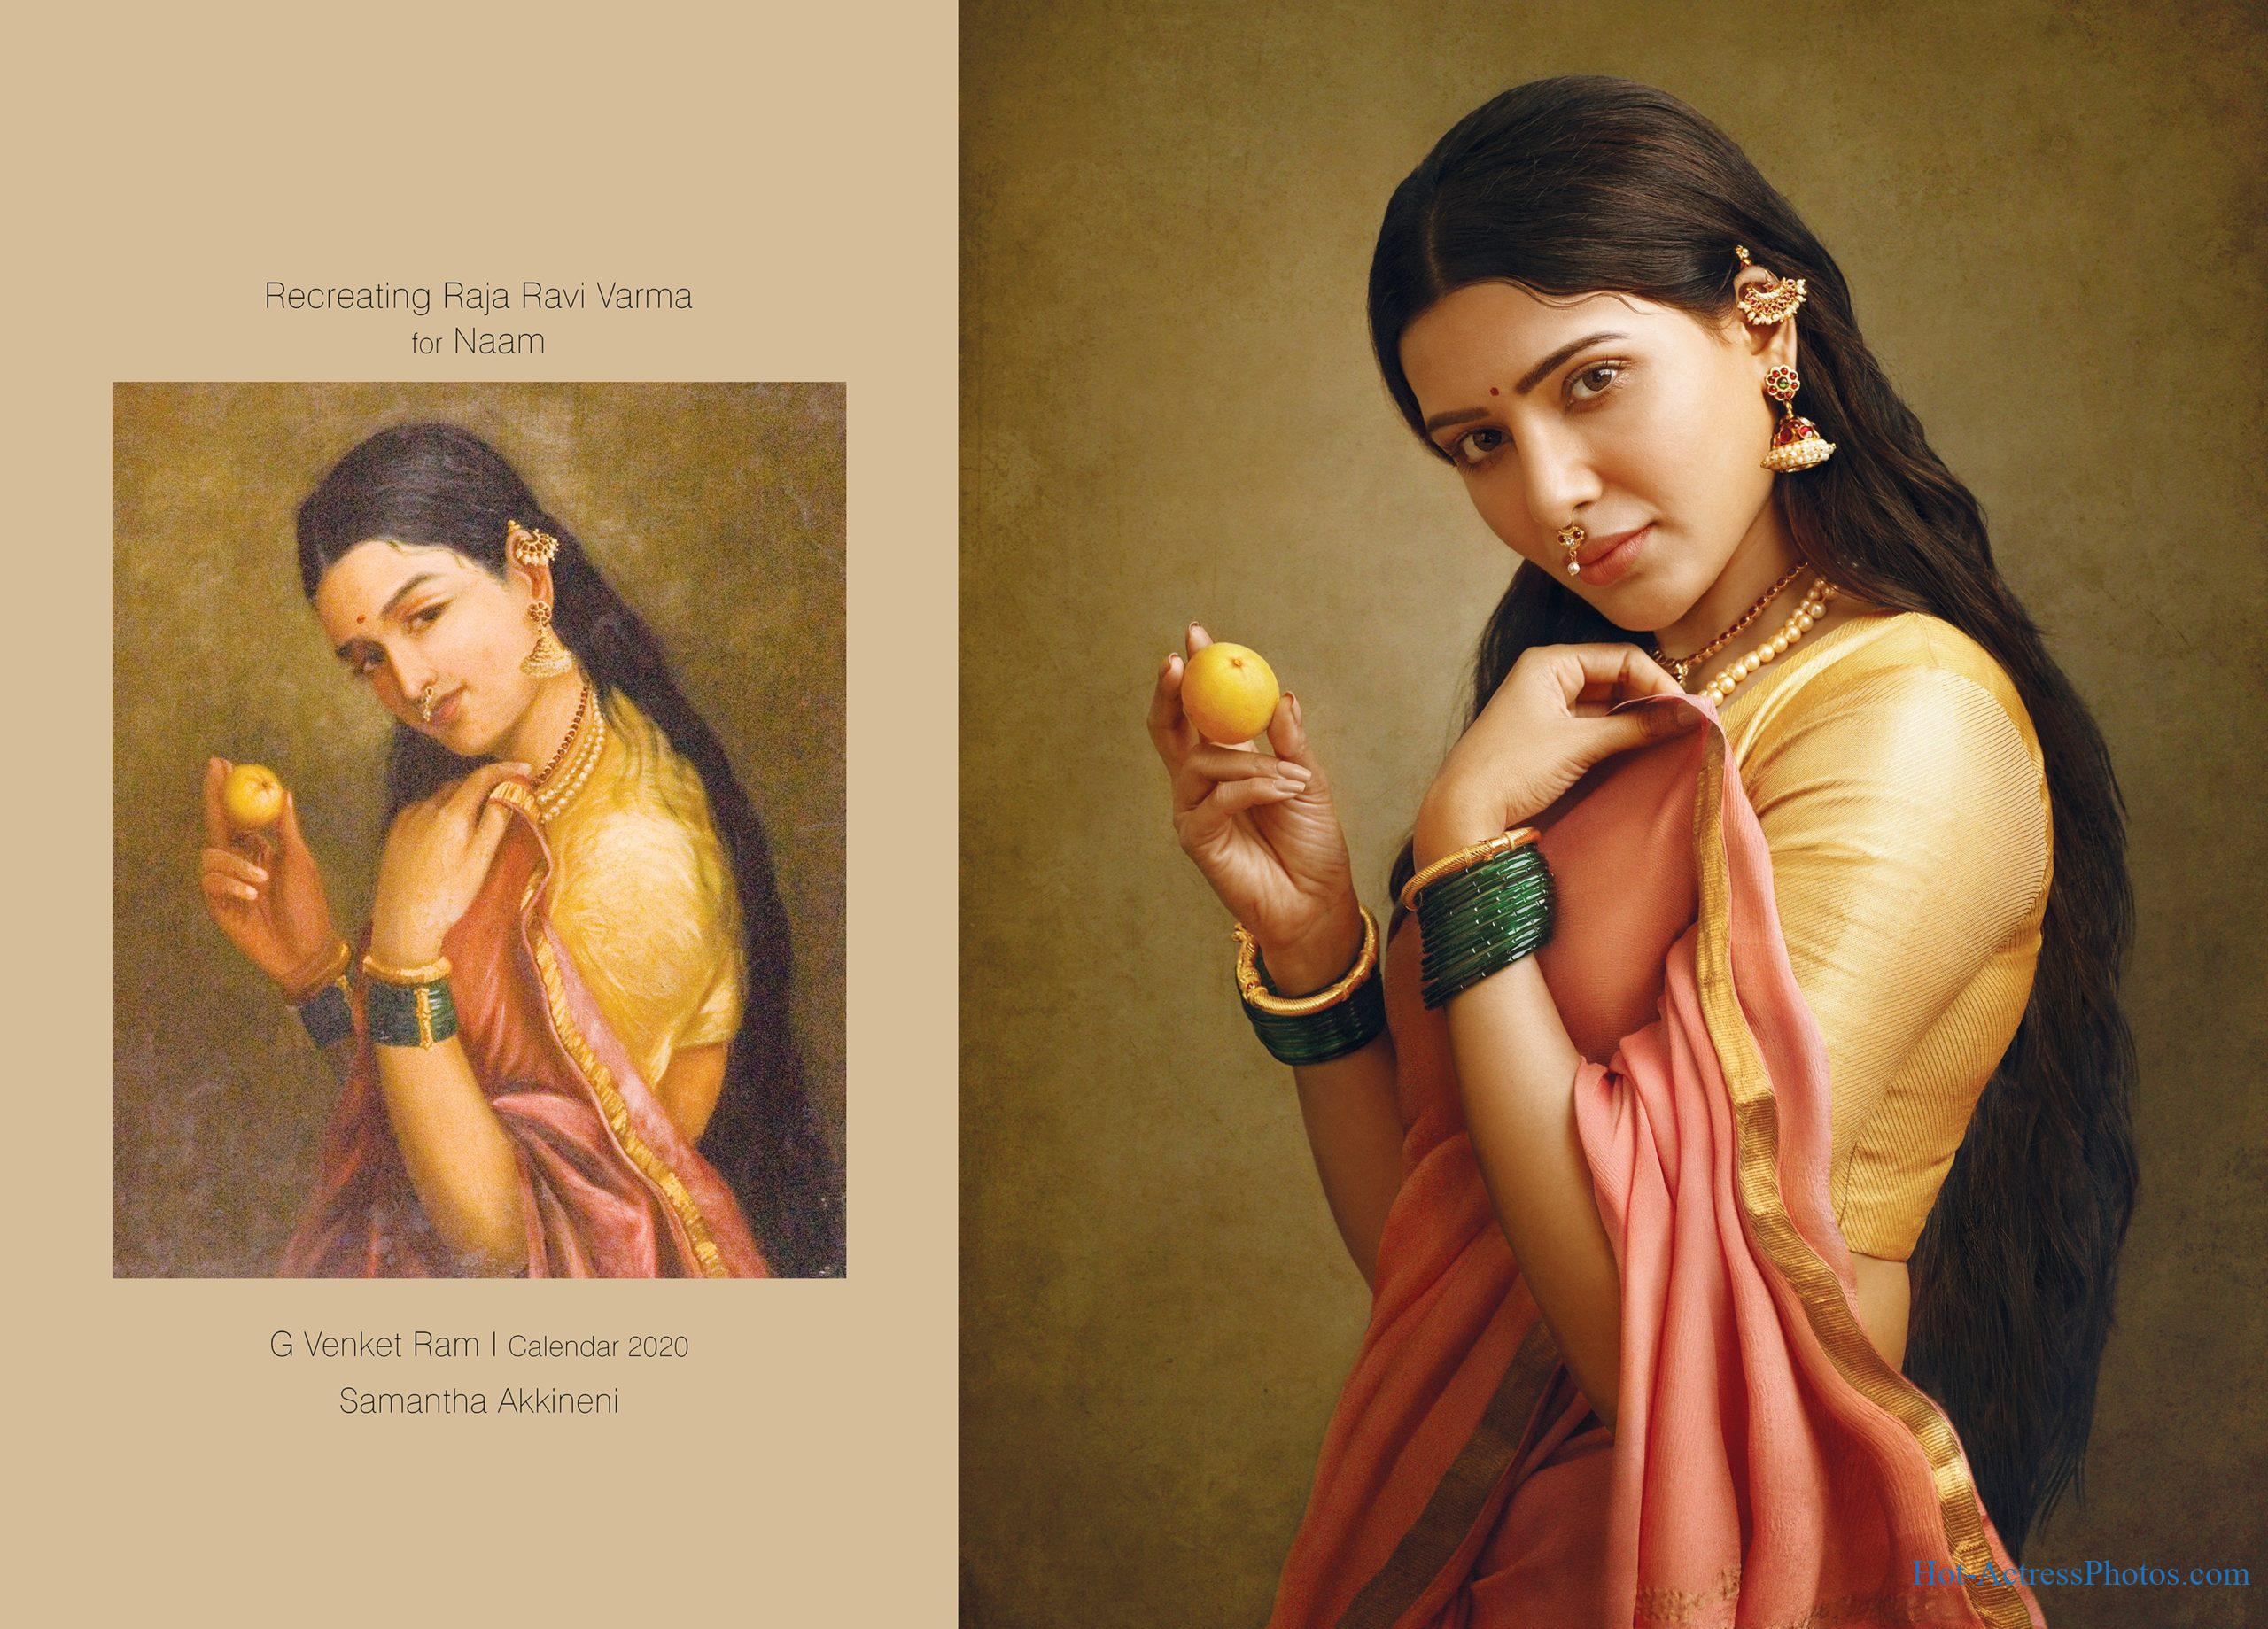 South Indian Actresses Portrait Raja Ravi Varma's Painting in G Venket Ram's Calendar 2020